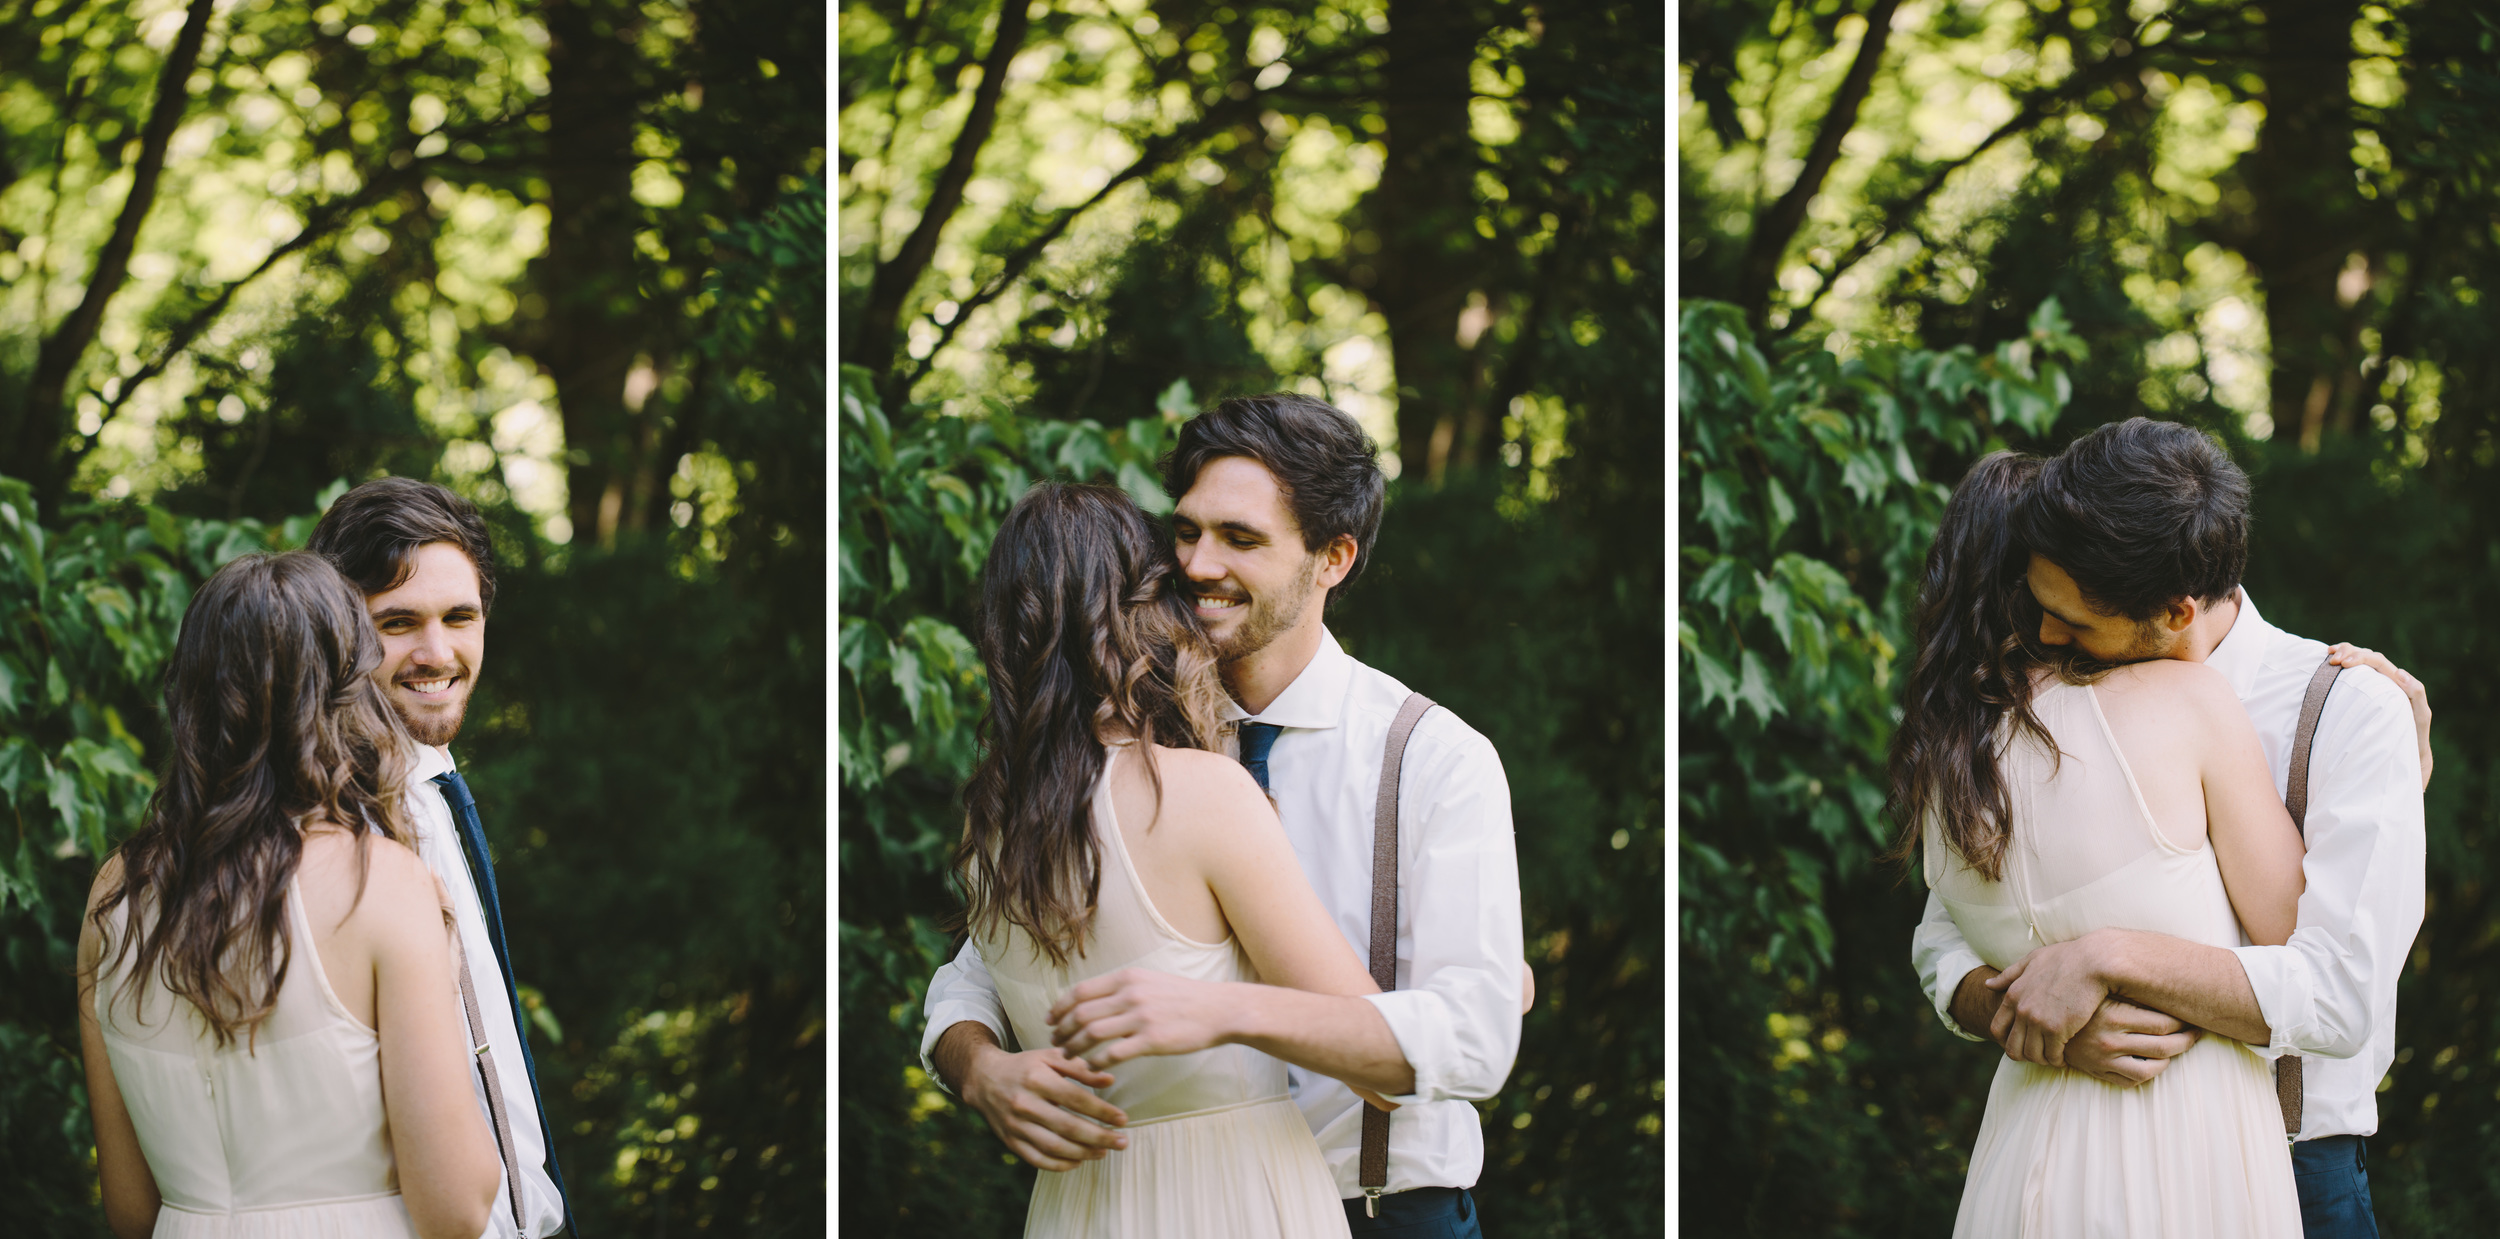 Zack + Hannah Millsaps Wedding in Greenville SC Nashville Wedding Photographer Photography Anthology-6 copy.jpg